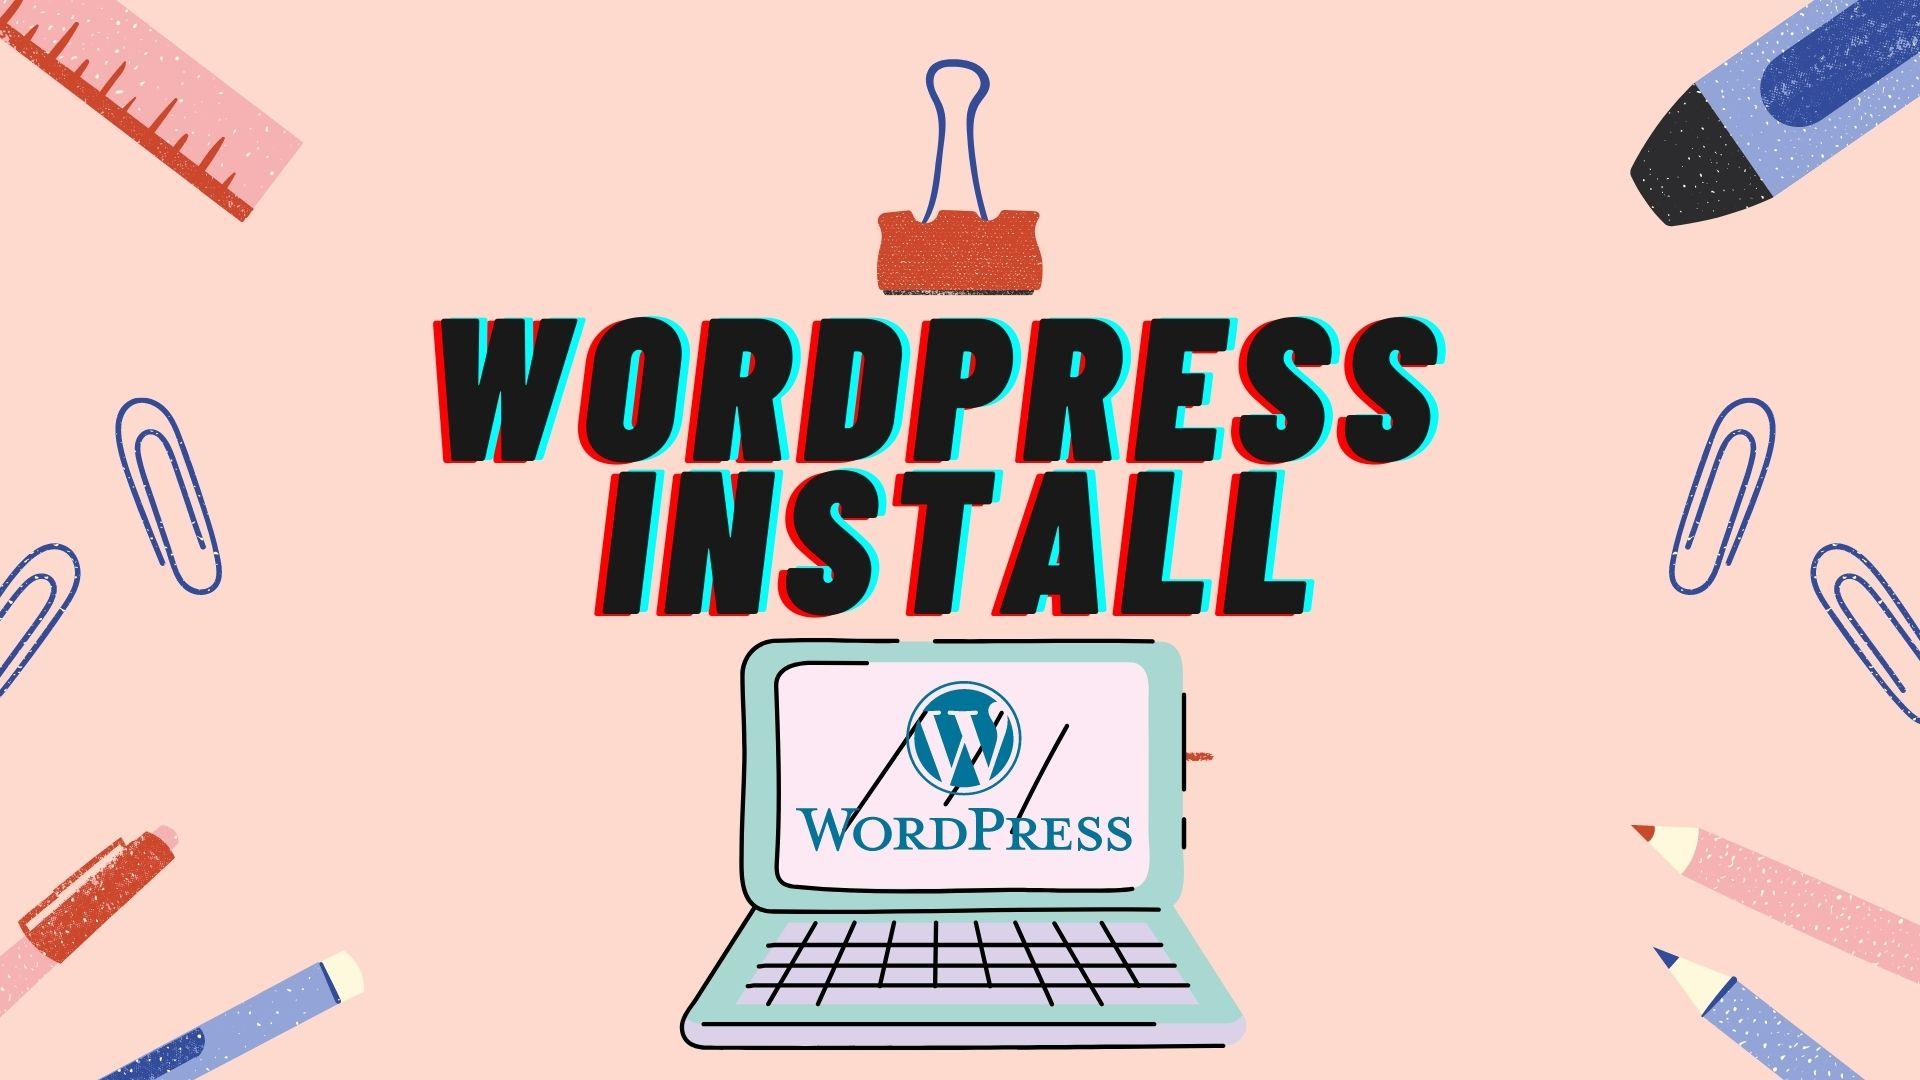 I will install WordPress,  setup theme and do customization